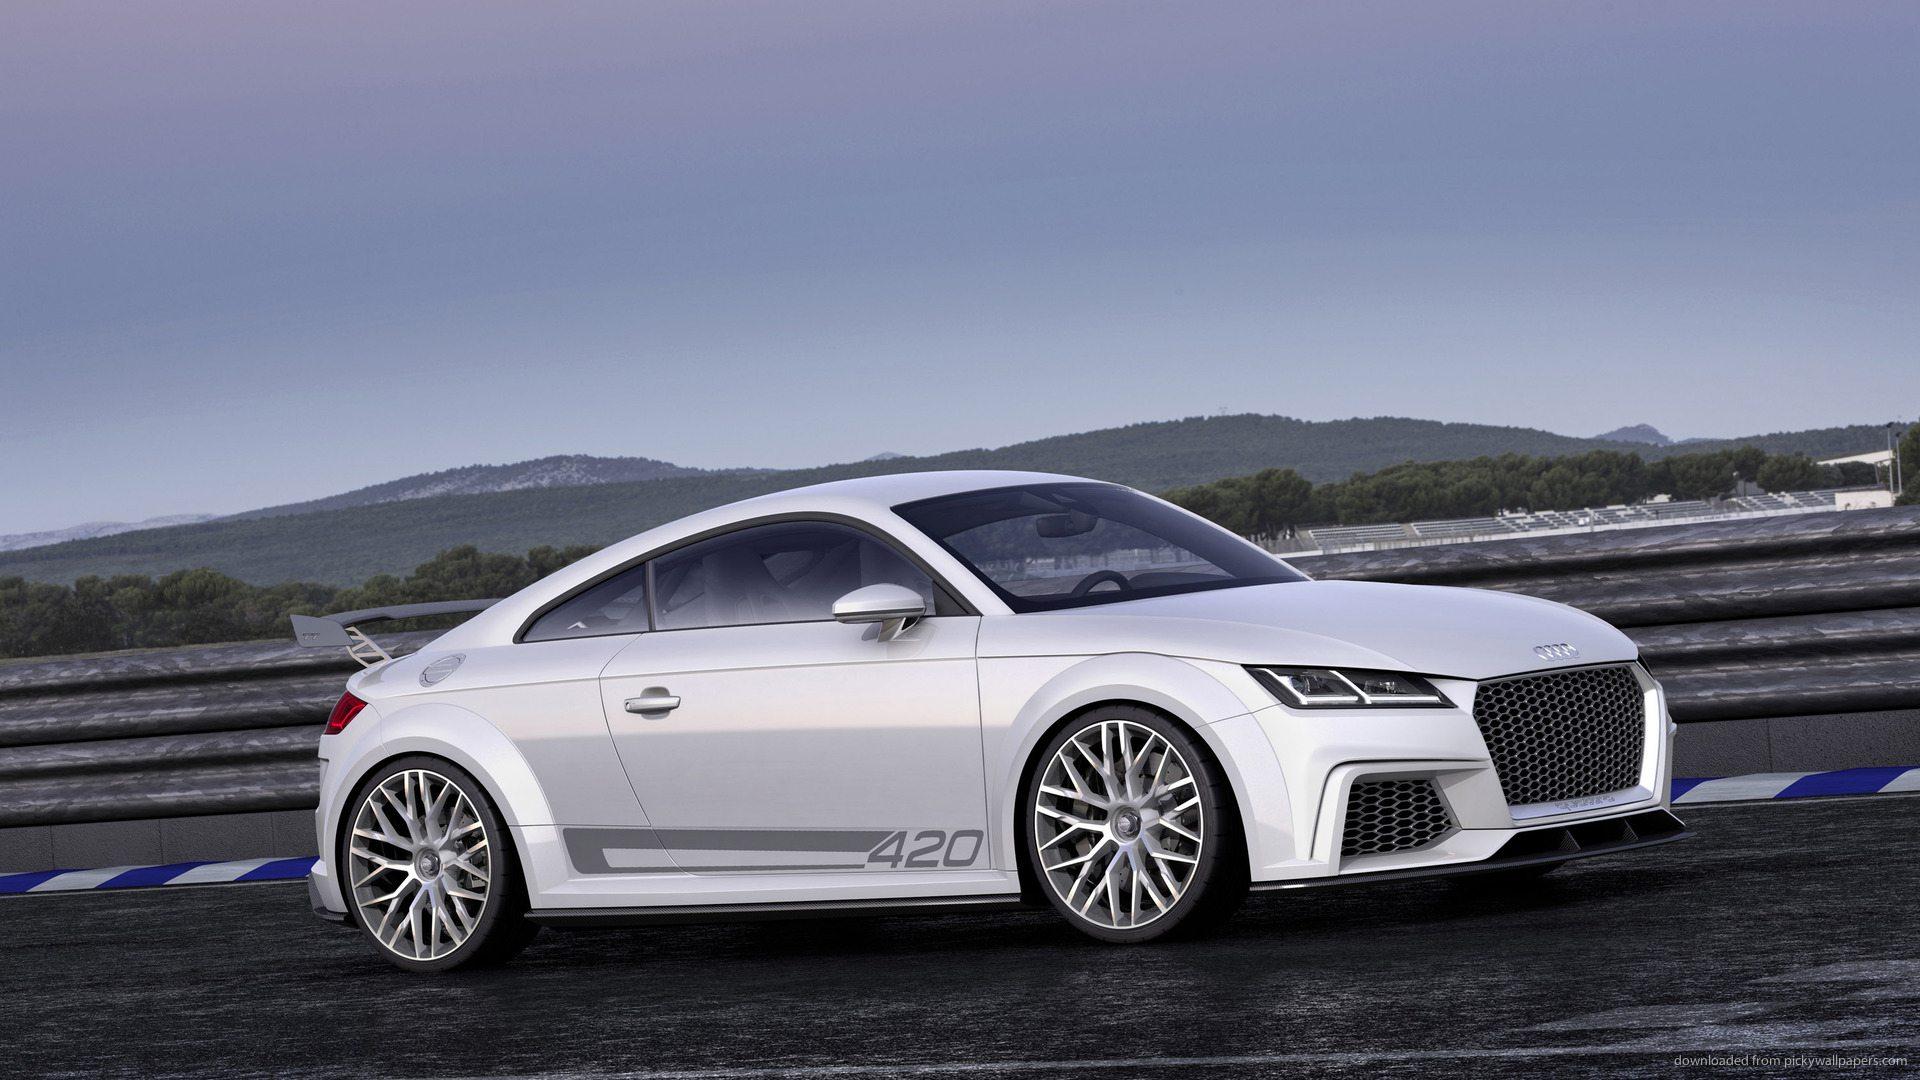 audi-tt-quattro-sport-concept-sideview